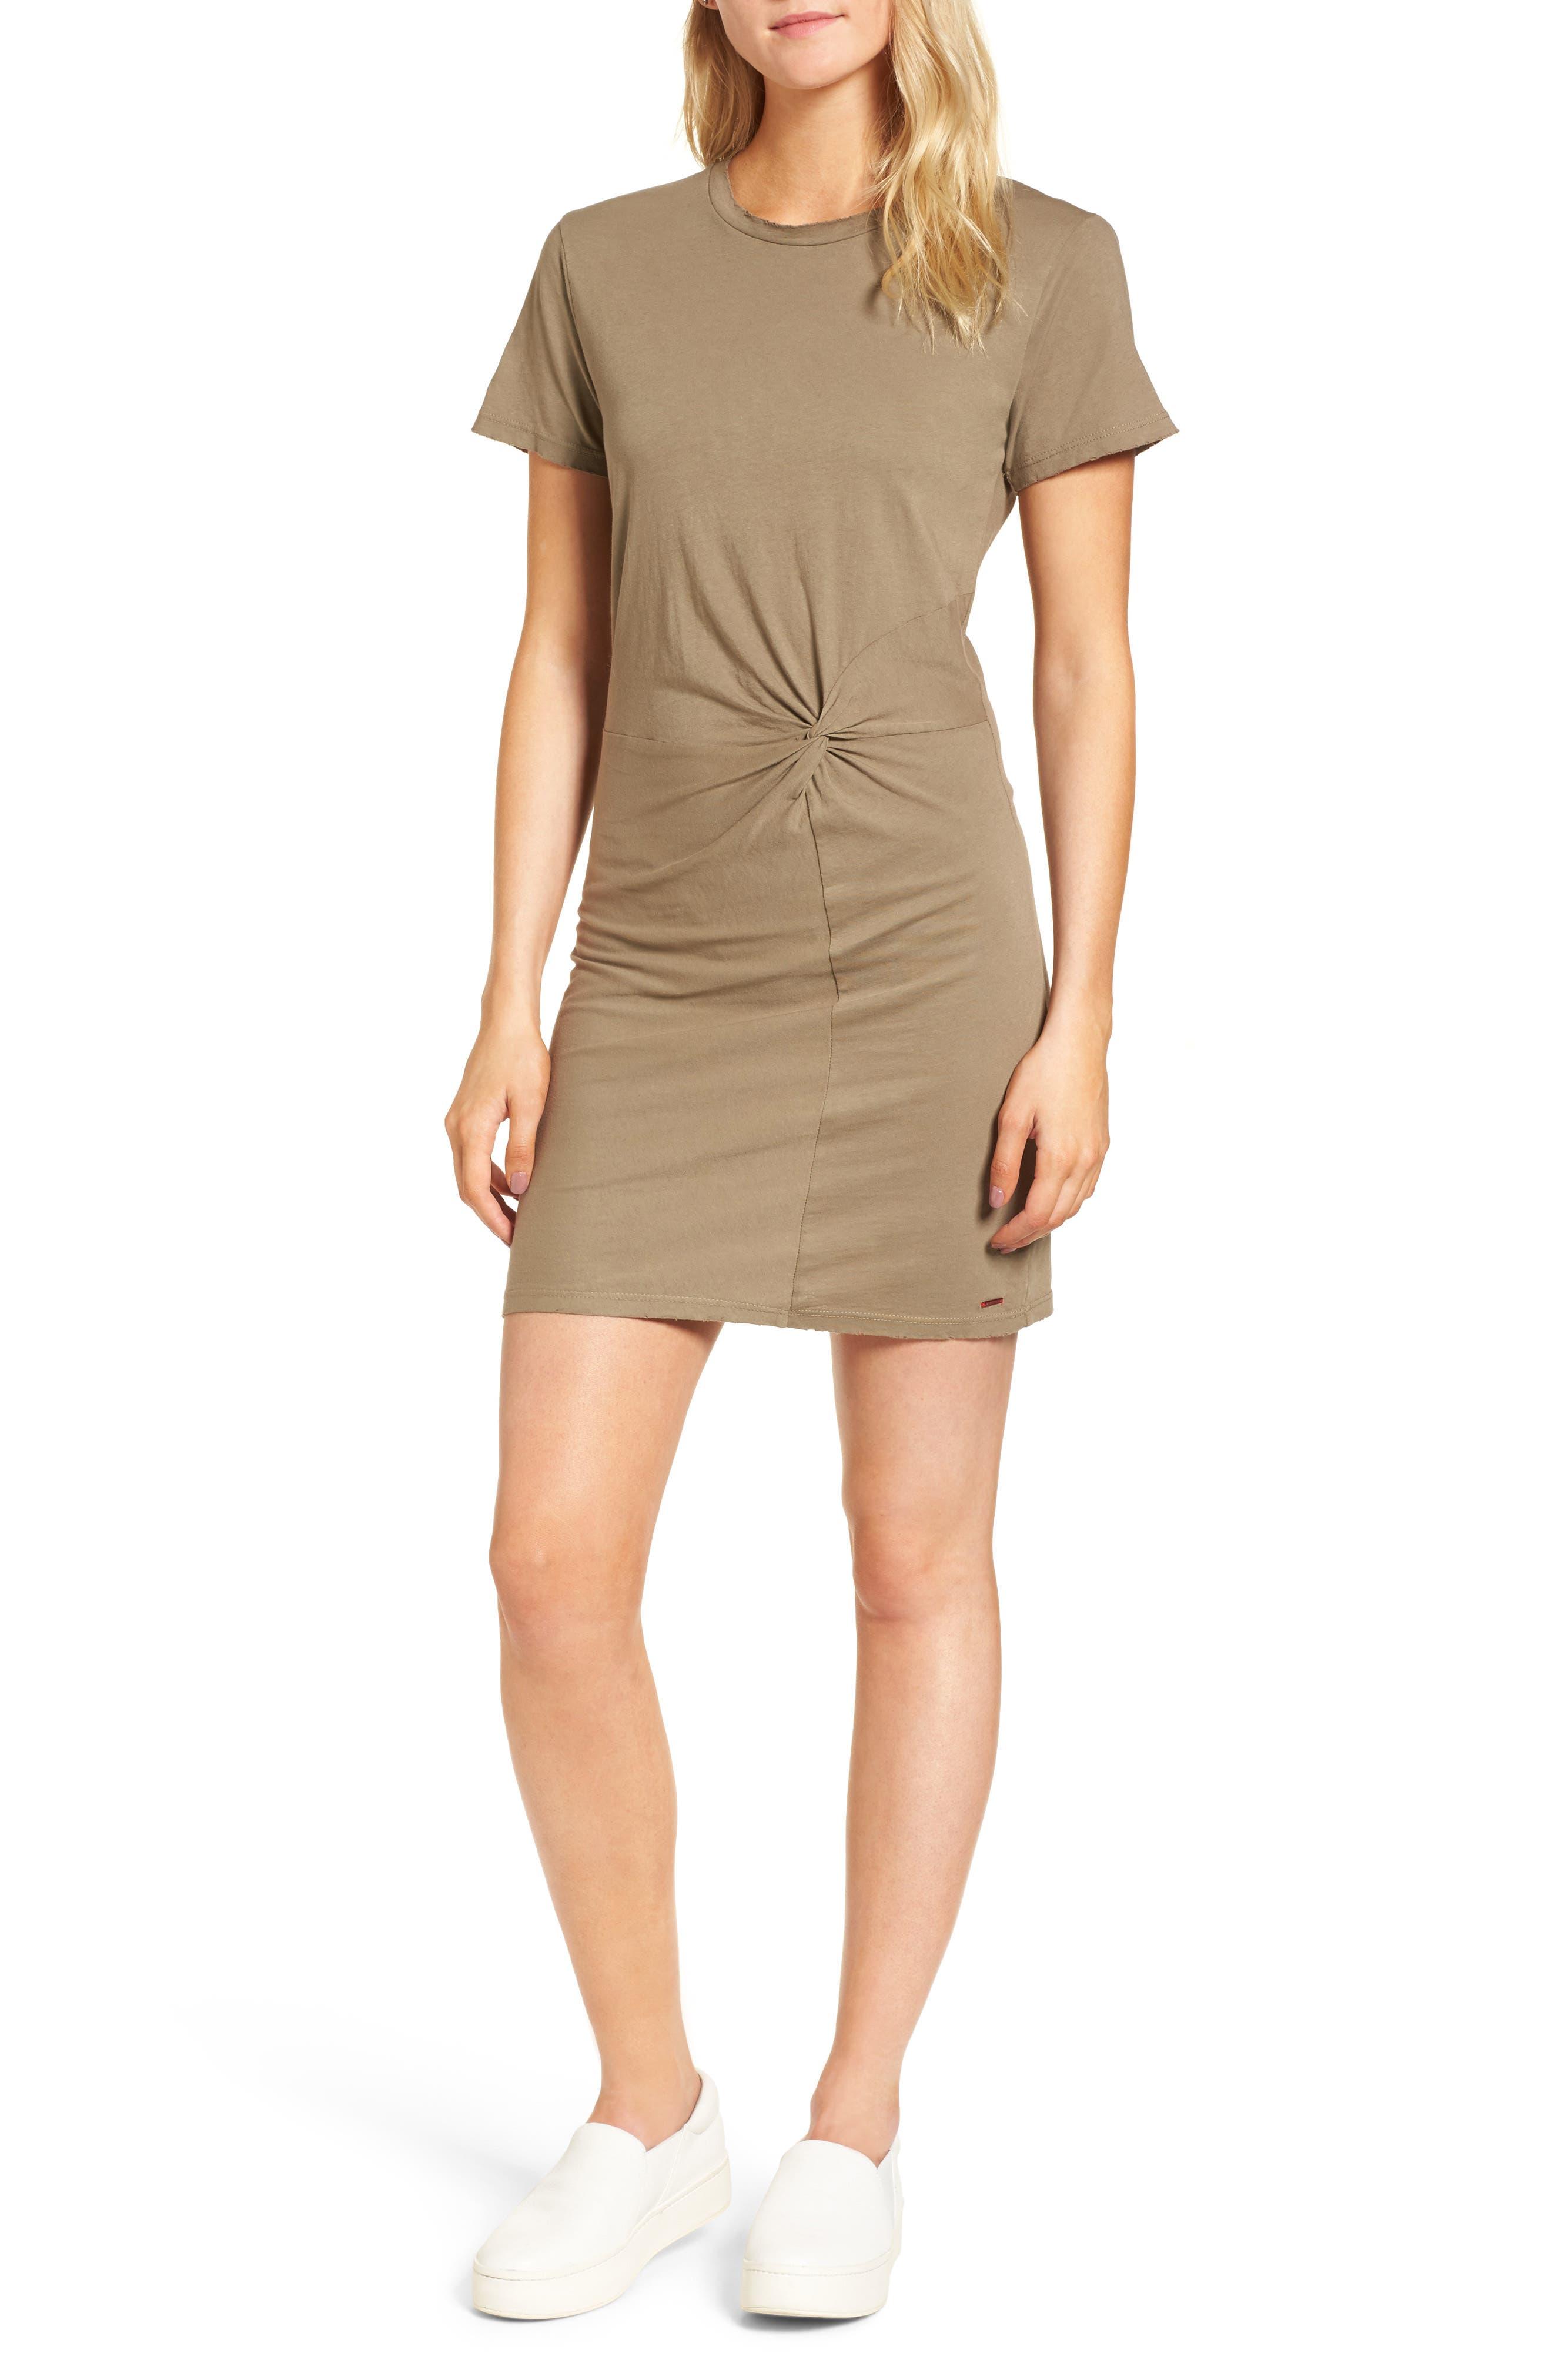 Main Image - n:PHILANTHROPY Jazz Knotted T-Shirt Dress